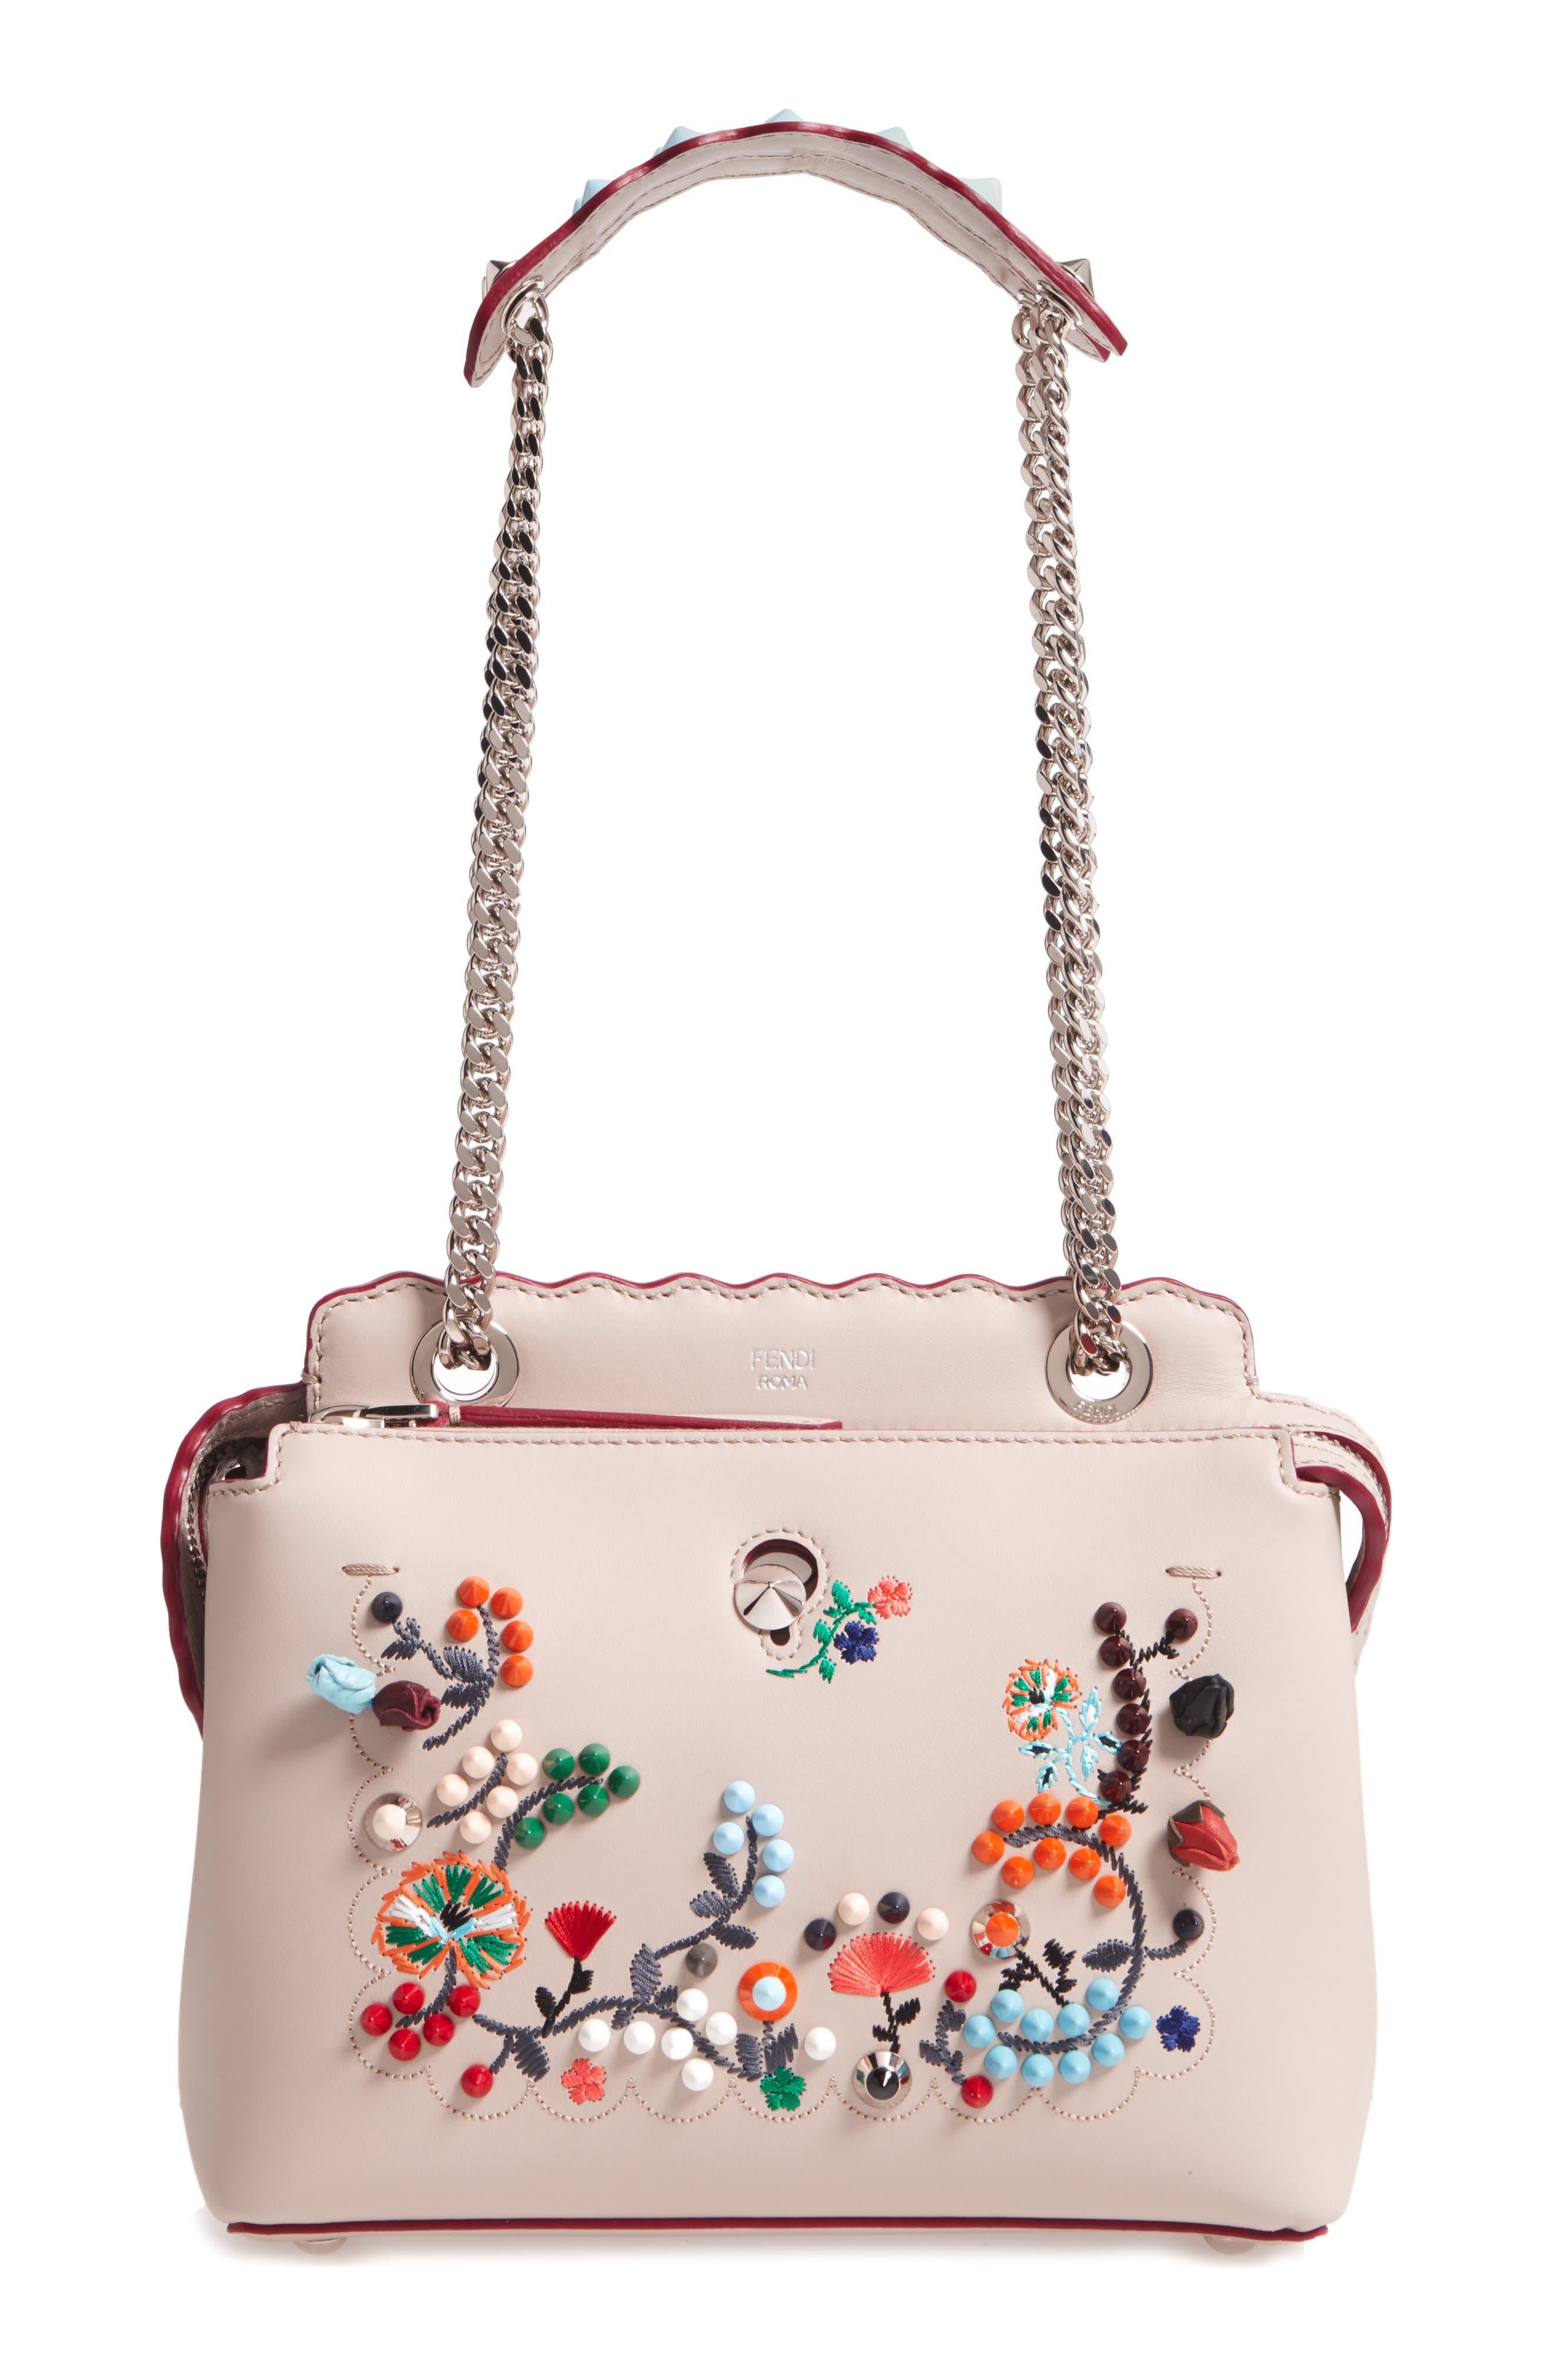 Alternate Image 1 Selected - Fendi Small Dotcom Leather Shoulder Bag